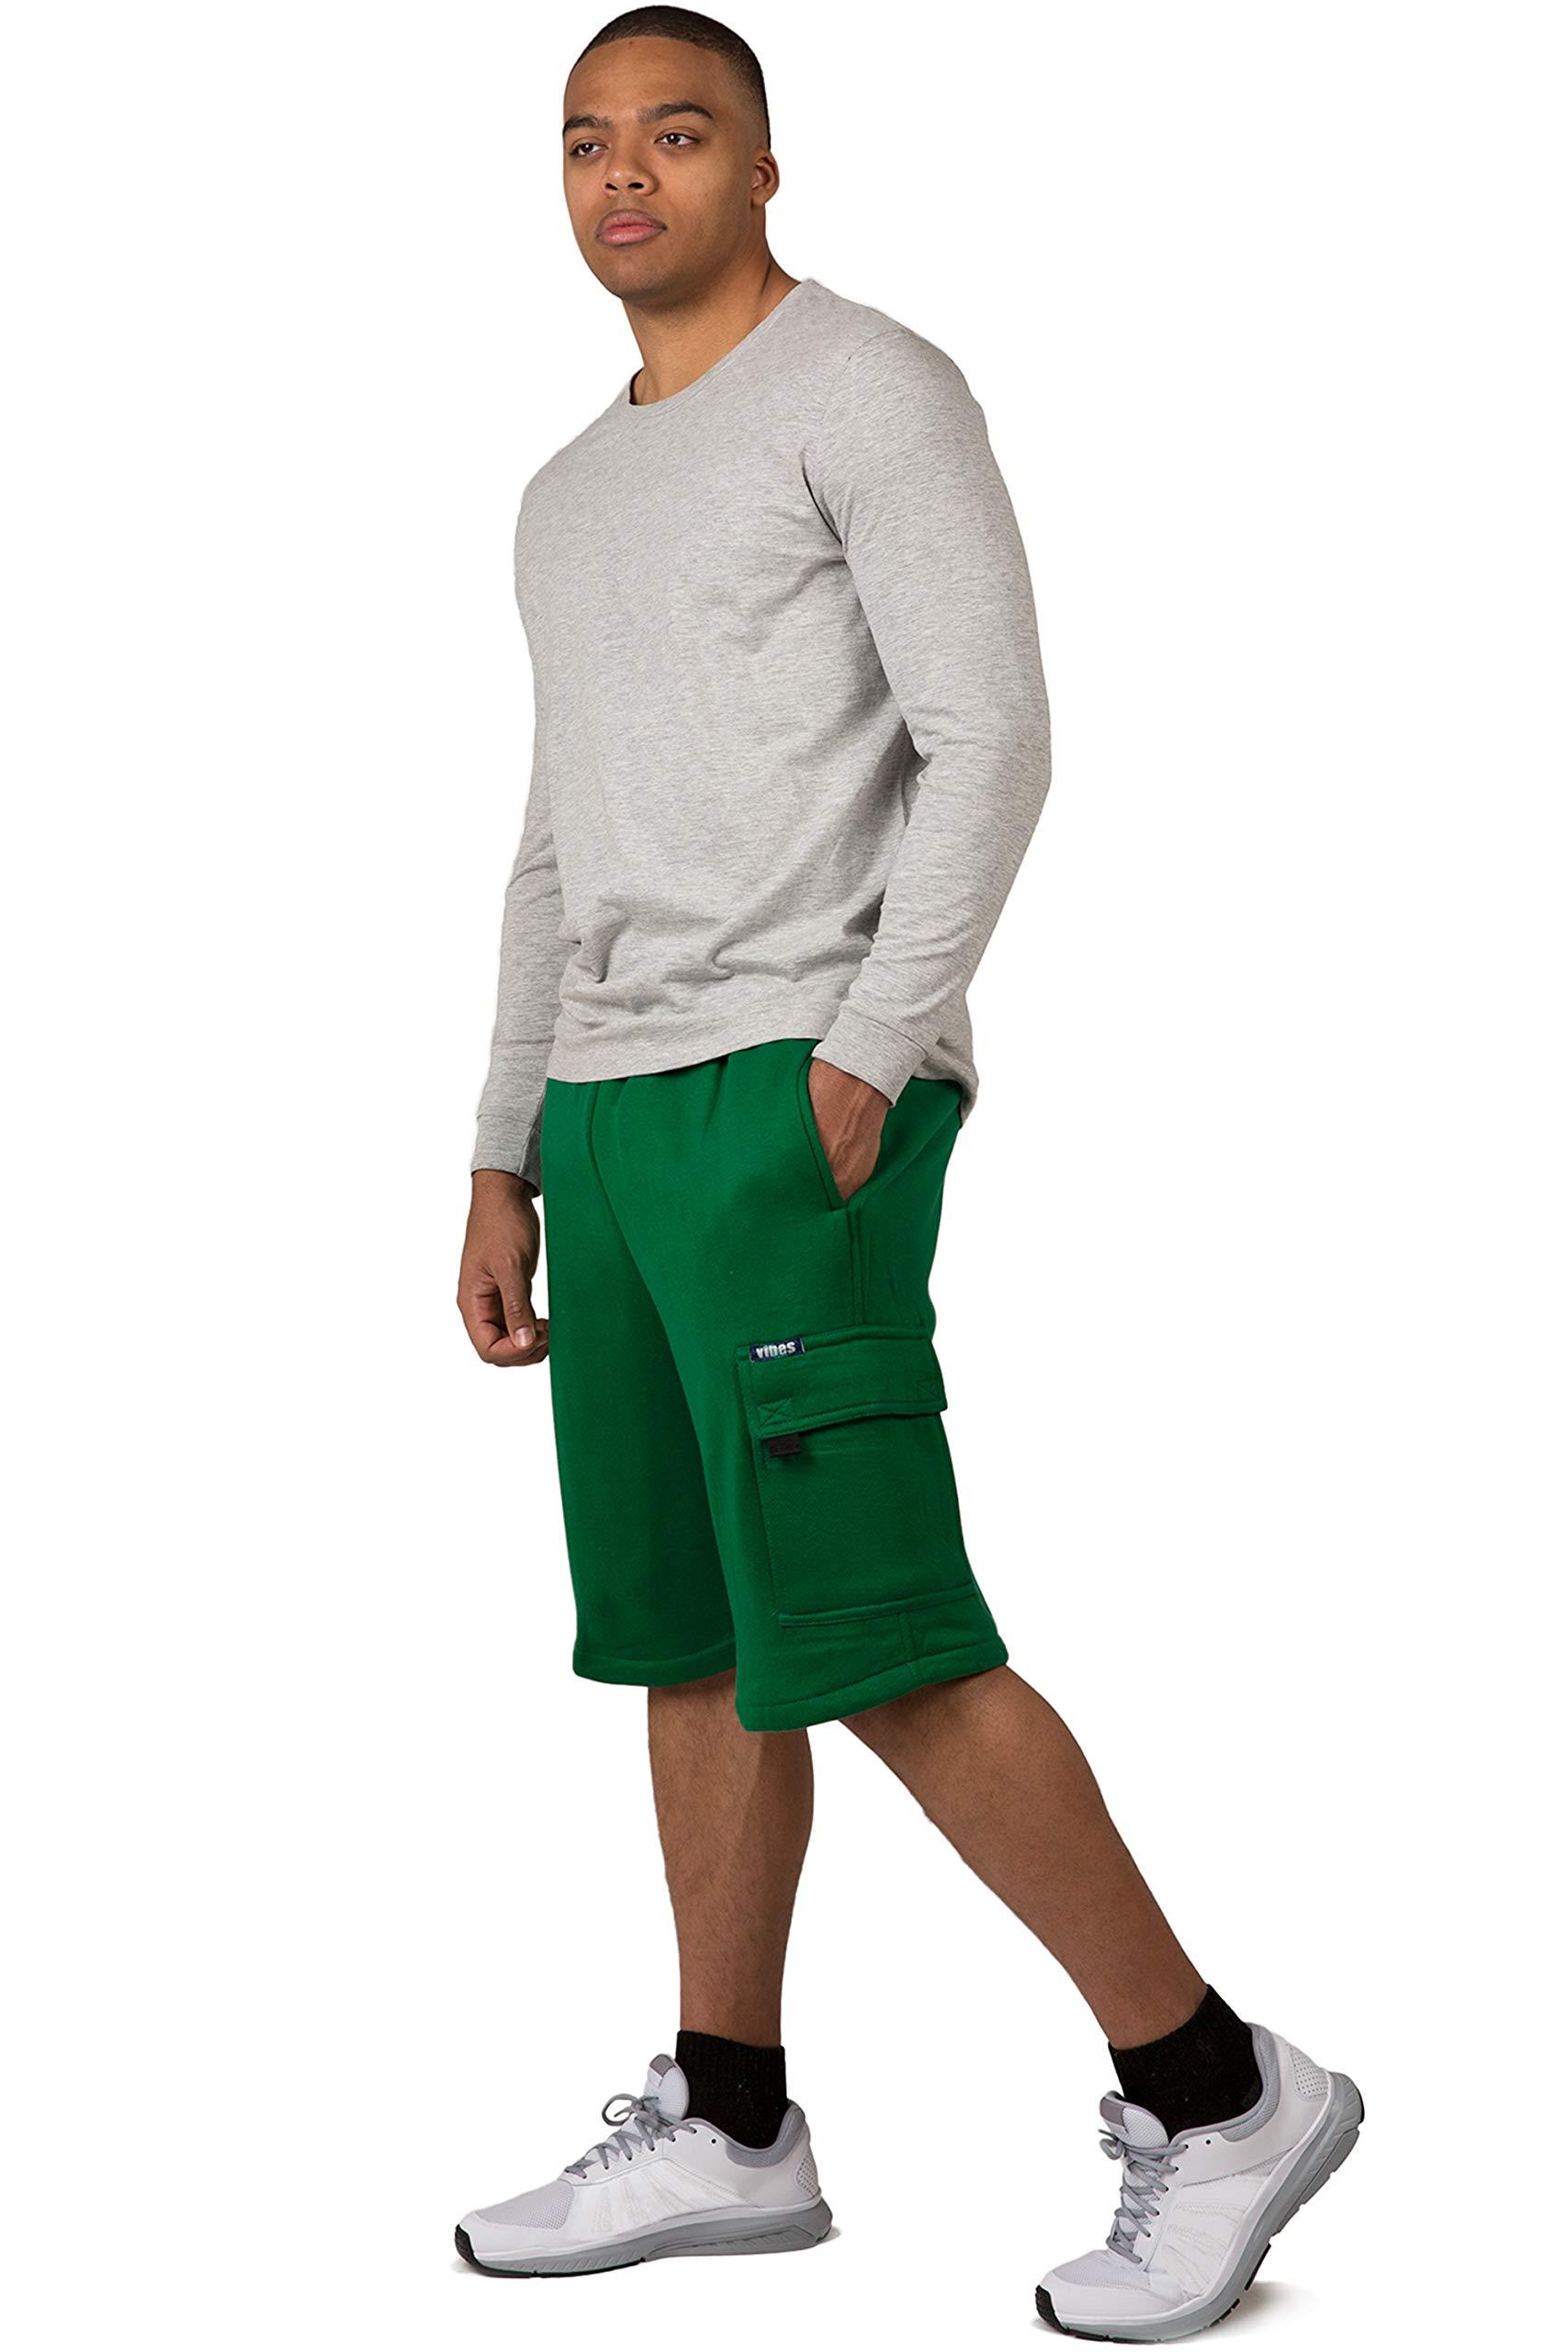 d9ed87ff7 Amazon.com: Vibes: Shorts & Capris